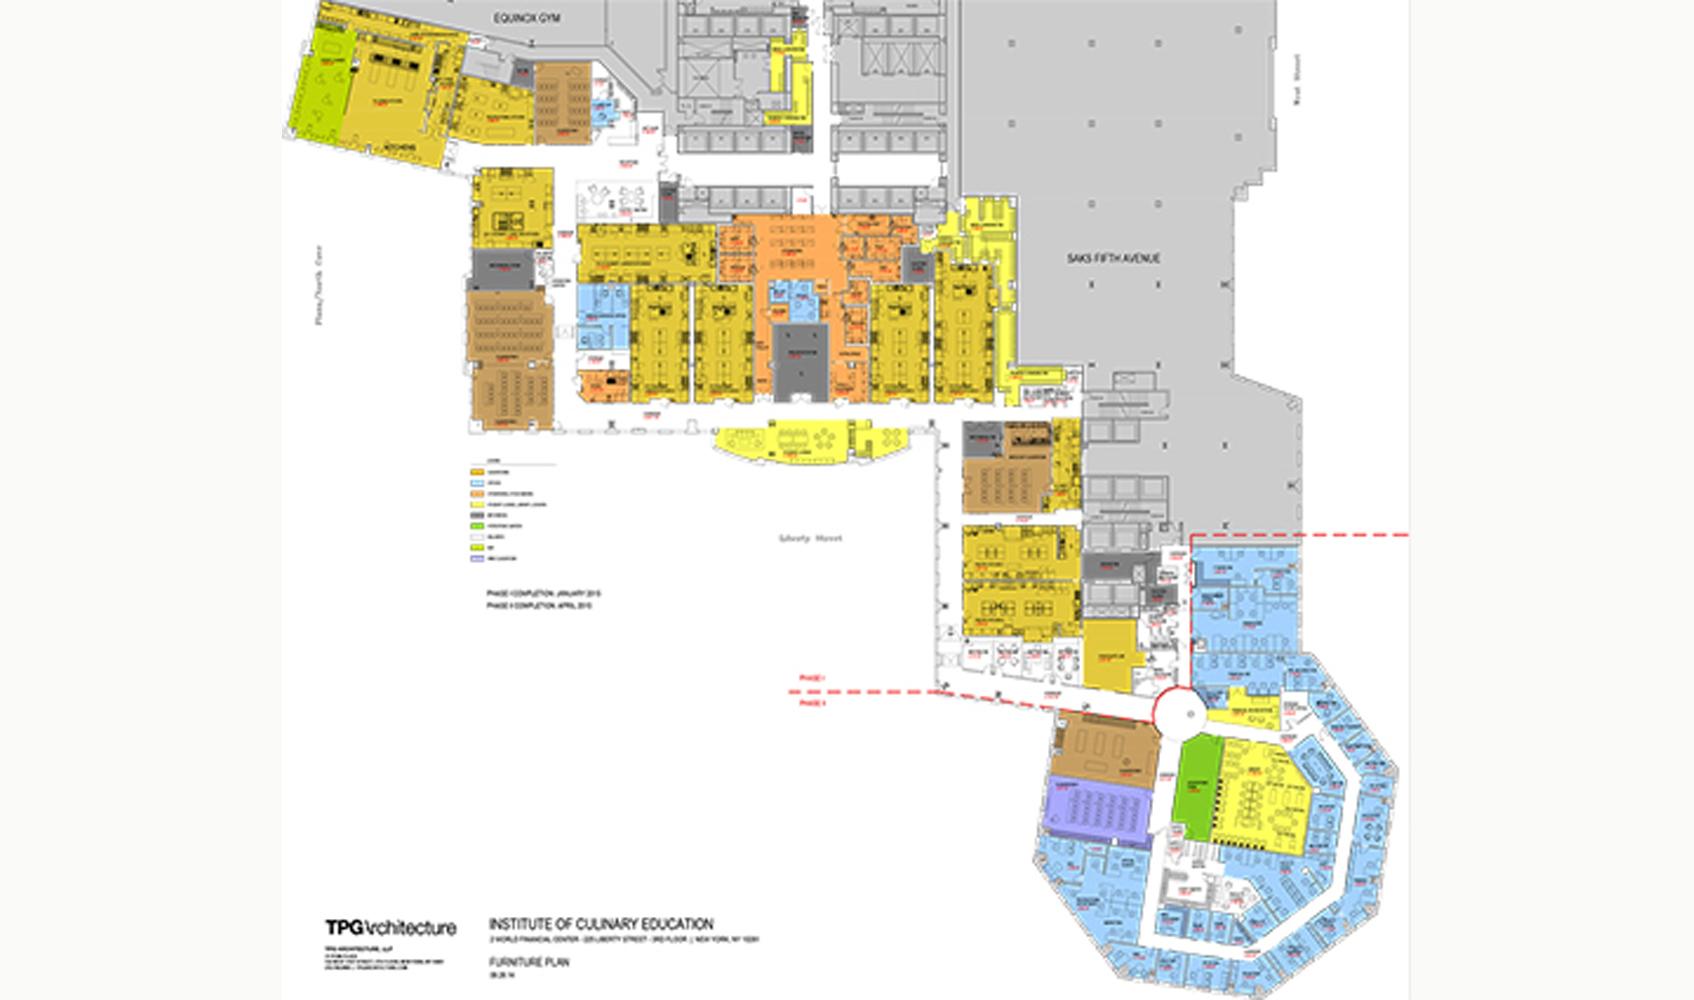 ICE culinary brookfield floor plan